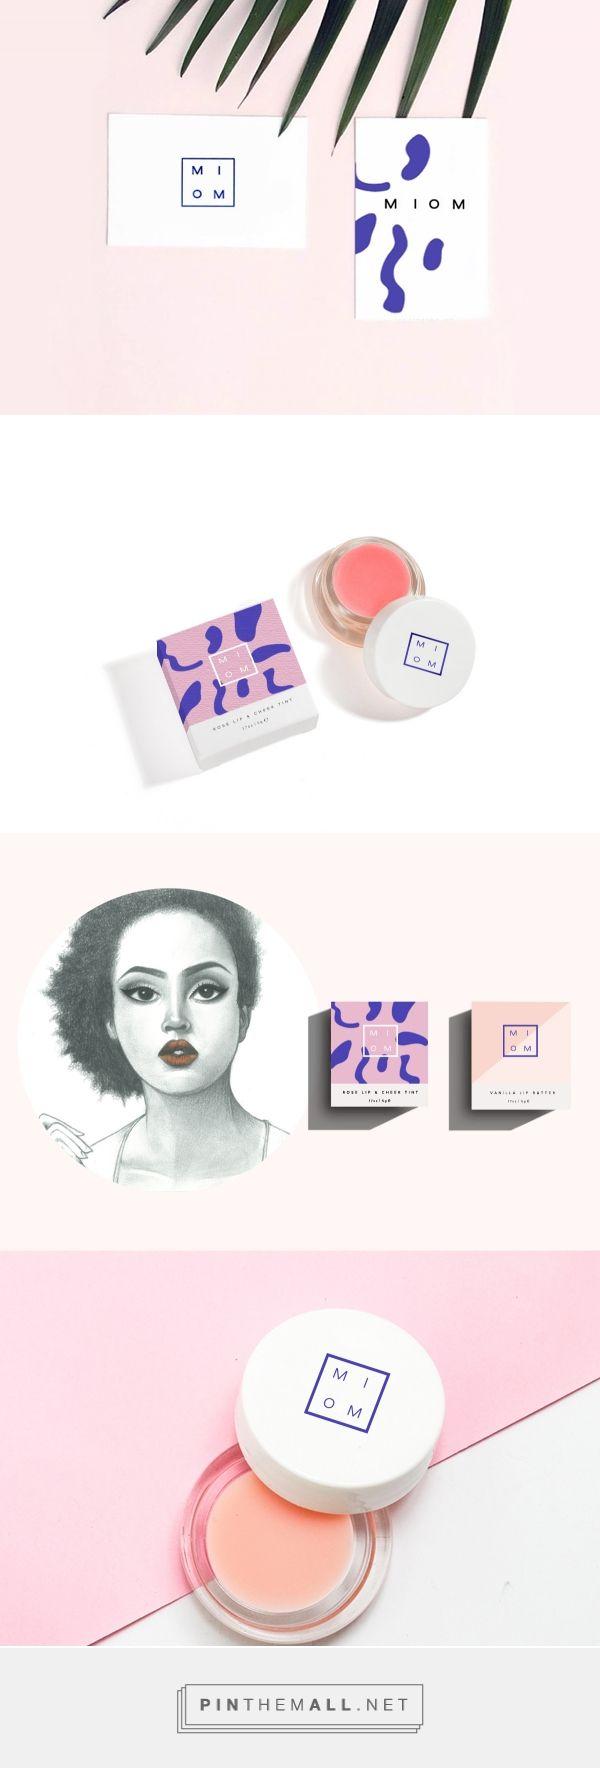 Miom Handmade Cosmetics Branding and Packaging by Gaby Altamirano | Fivestar Branding – Design and Branding Agency & Inspiration Gallery